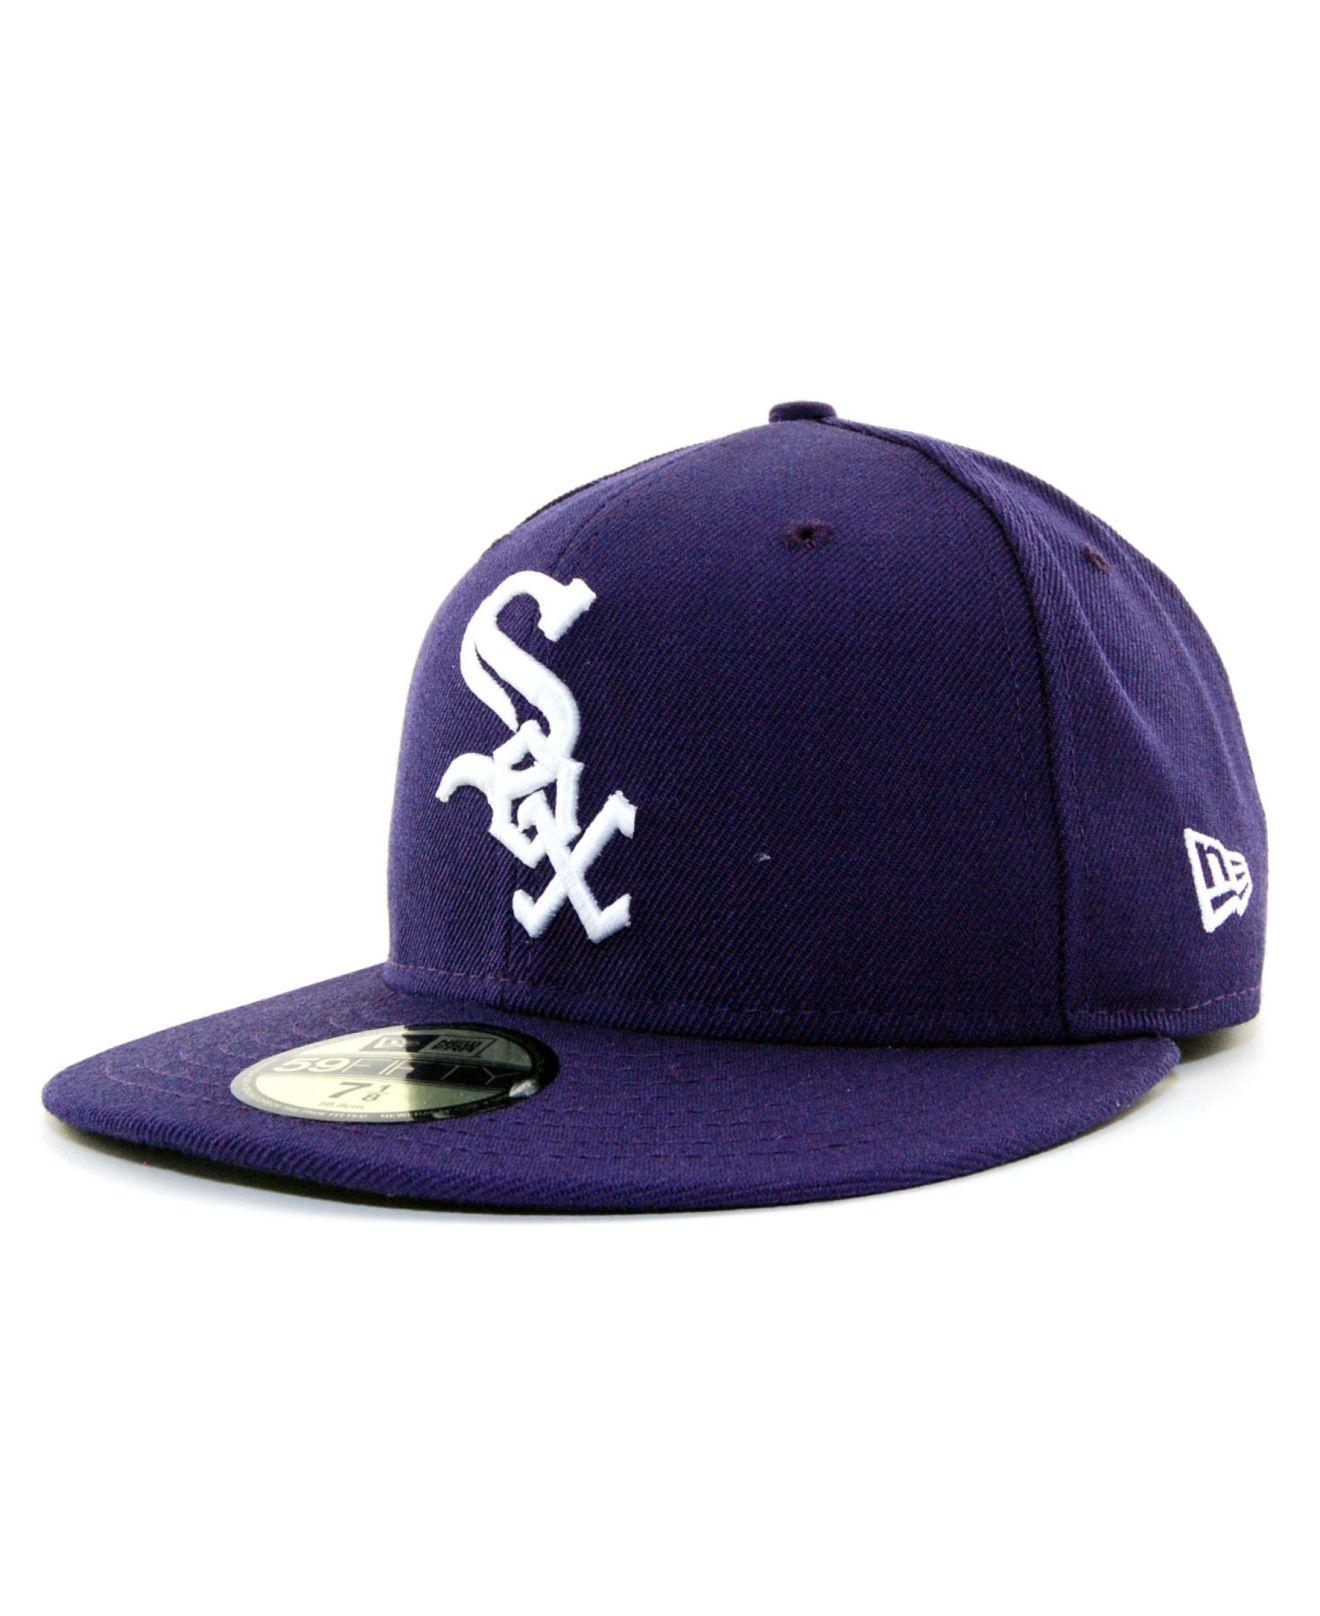 the best attitude ee091 d19d4 KTZ Chicago White Sox C-dub 59fifty Cap in Purple for Men - Lyst